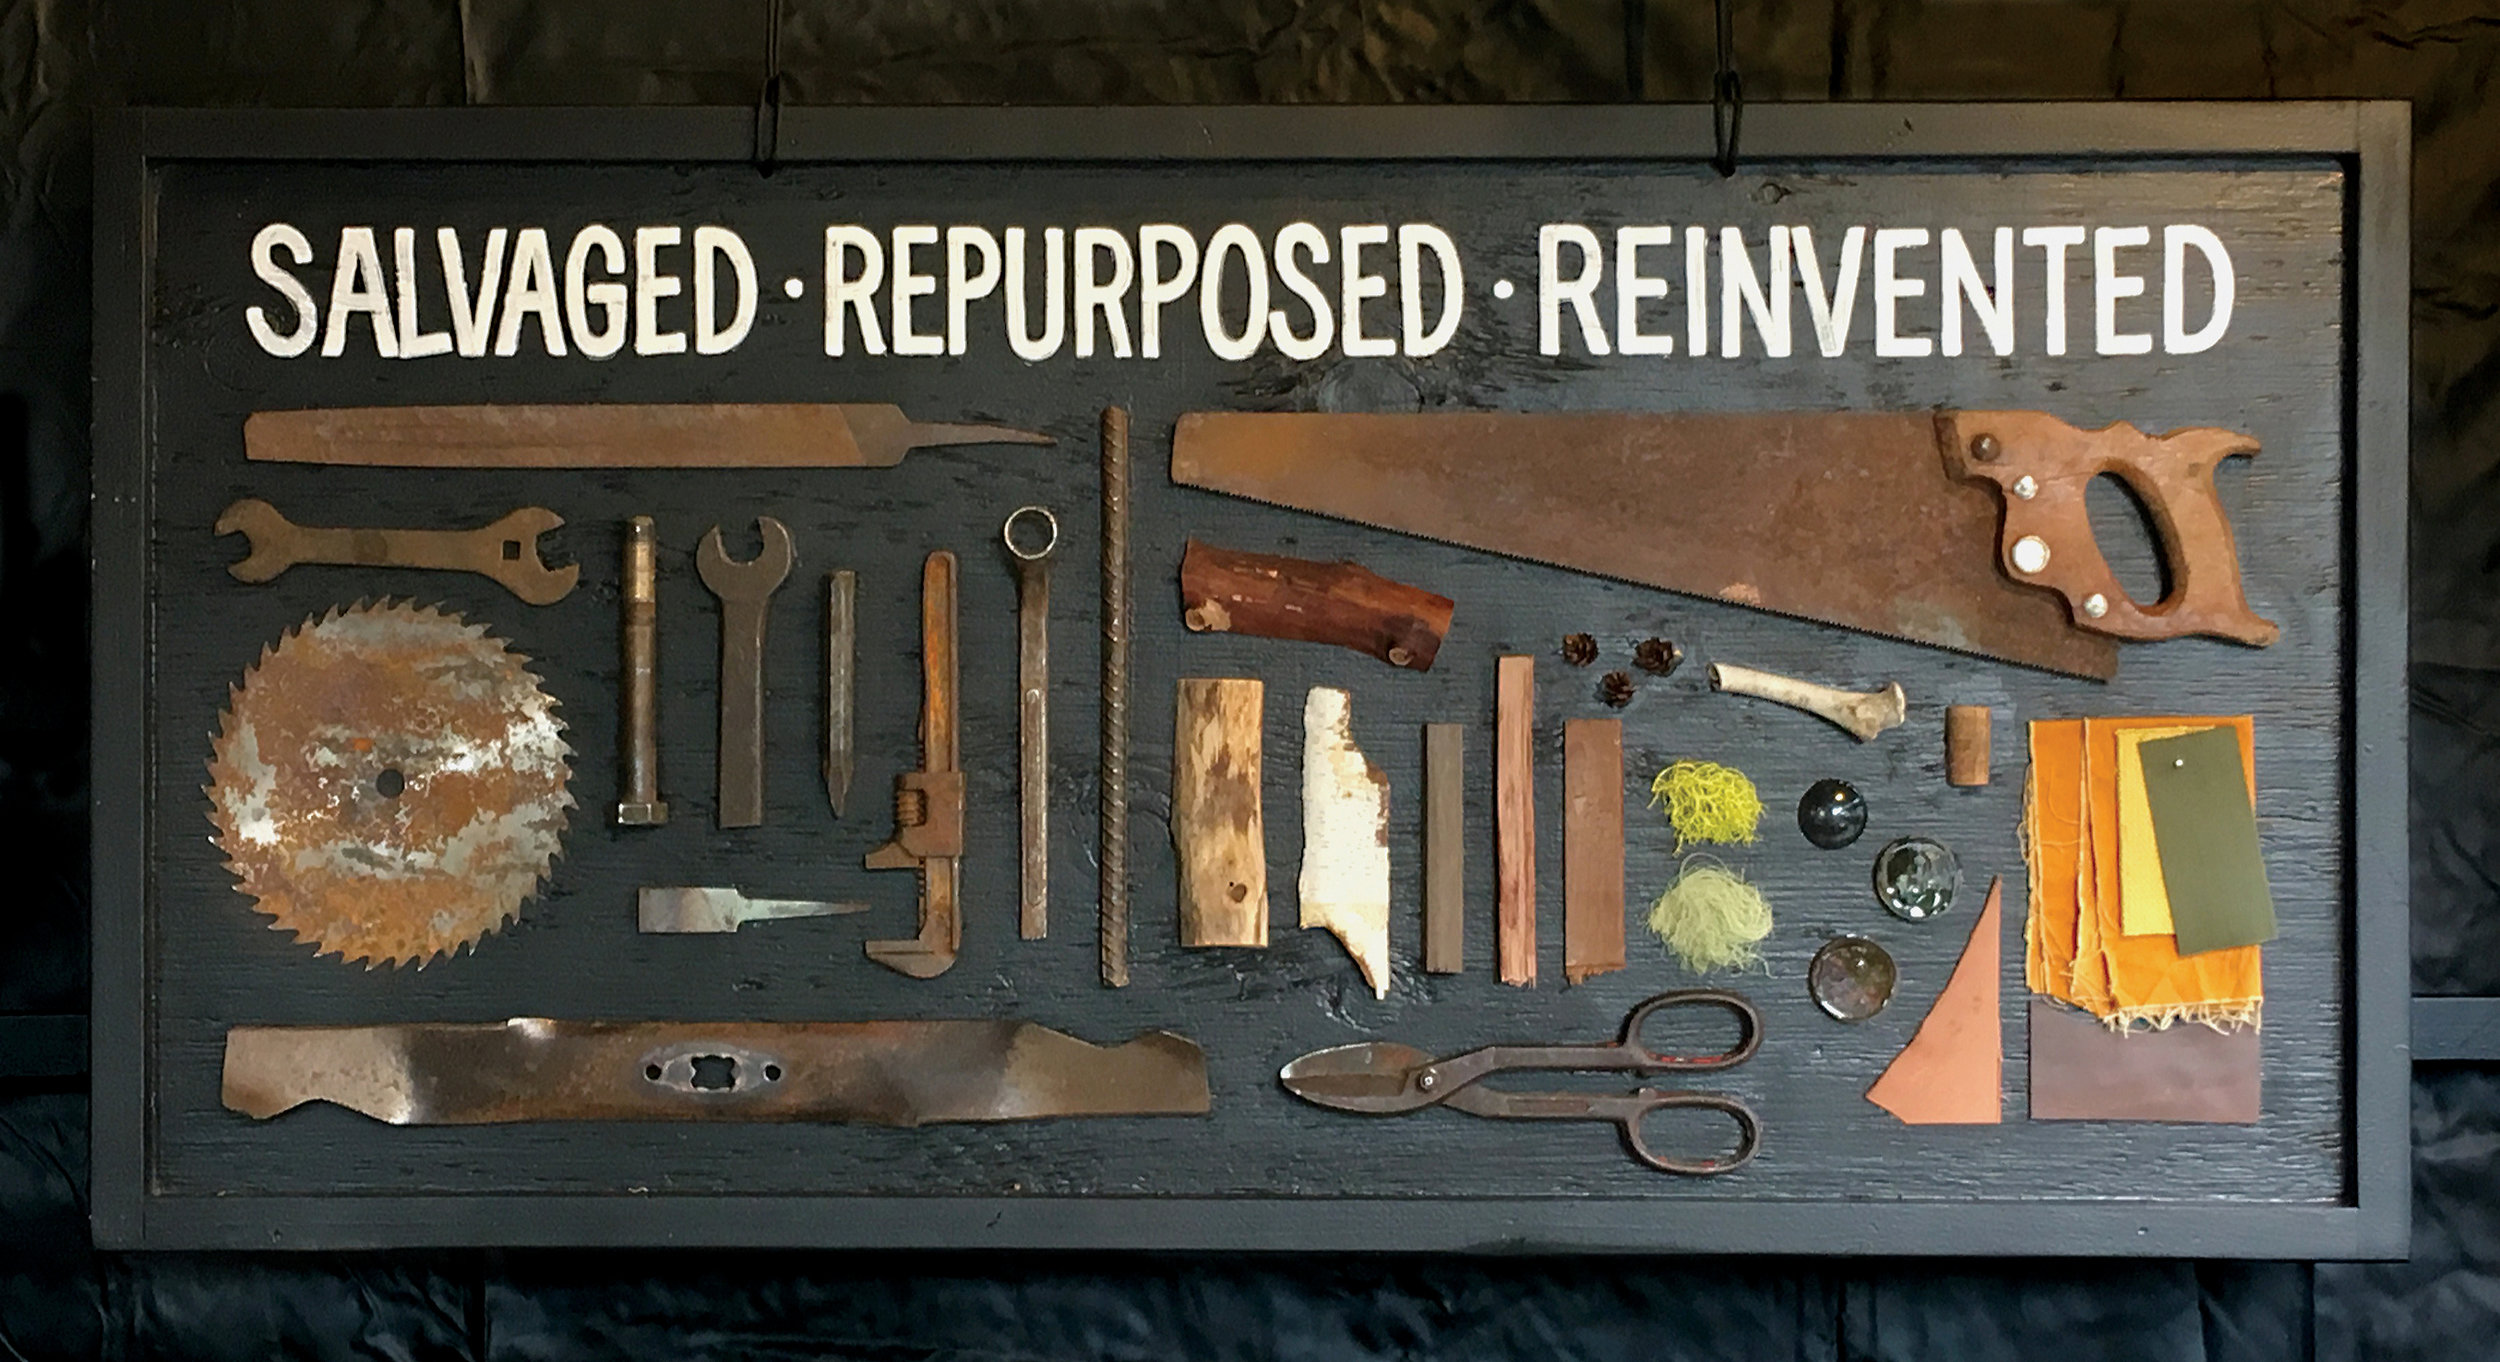 SalvagedRepurposed_SIGN2.jpg